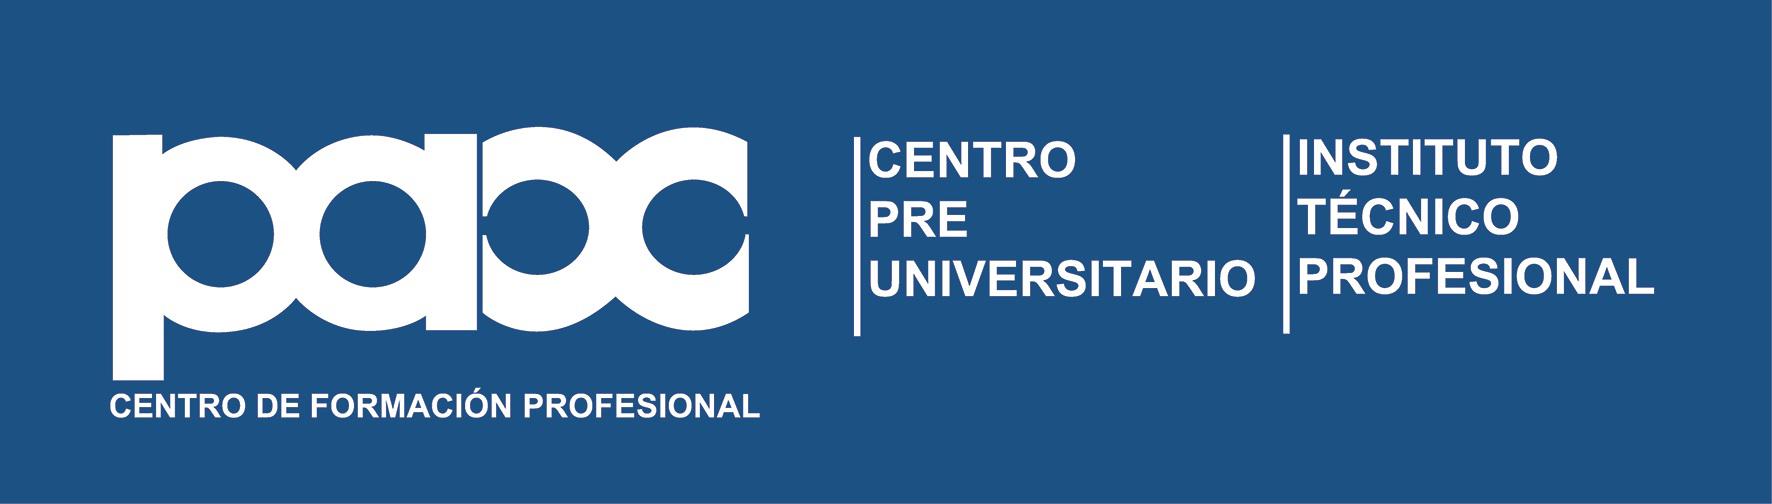 INSTITUTO TÉCNICO PROFESIONAL PAX, S.L. B46238325